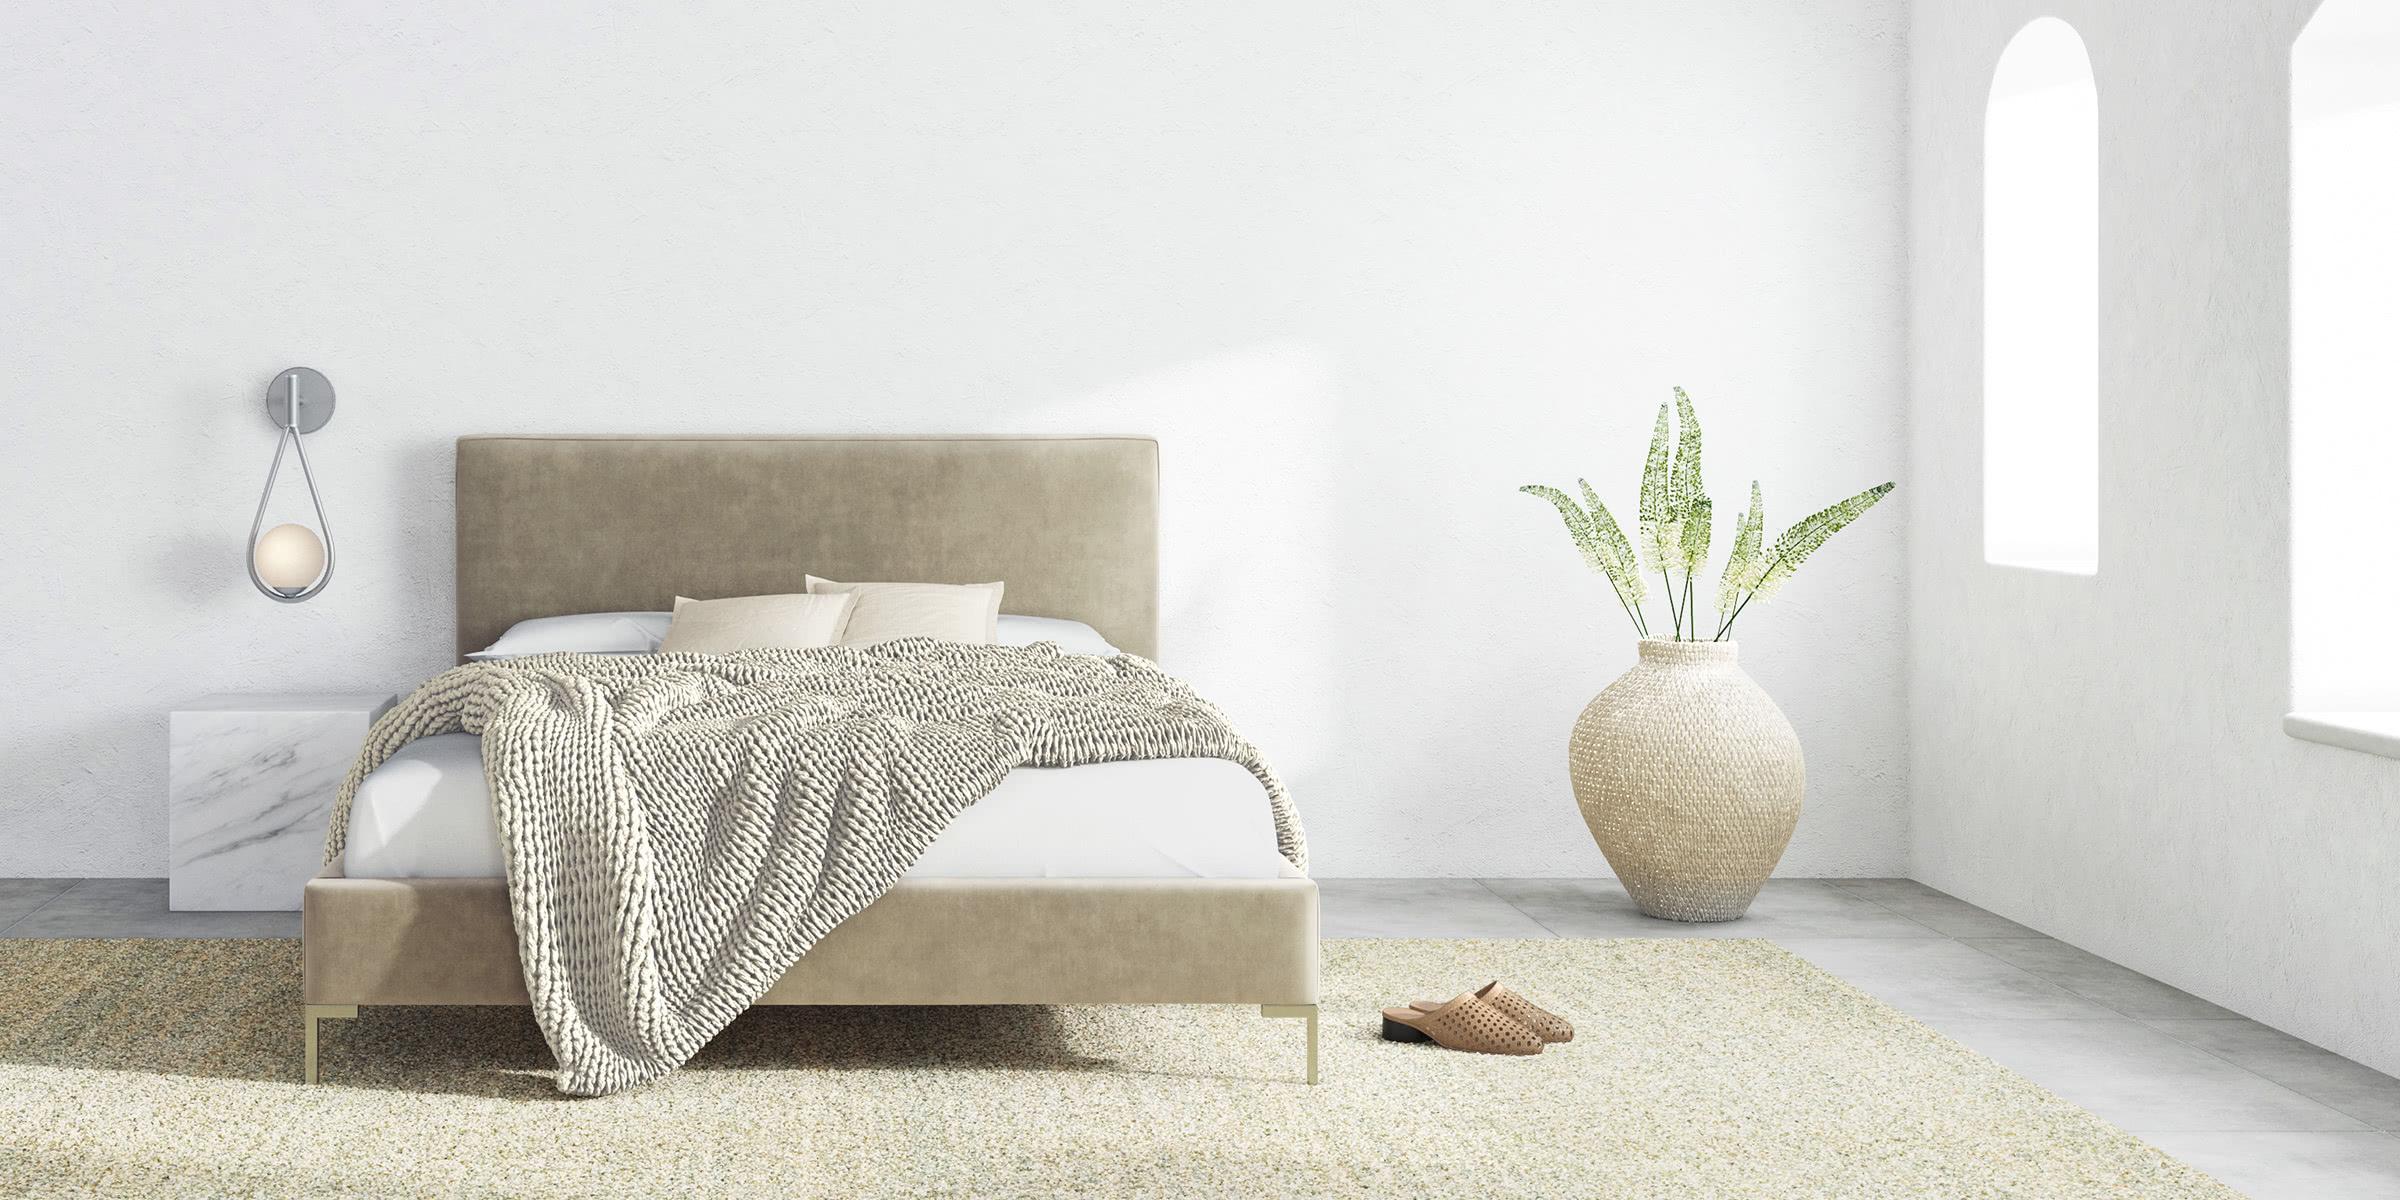 Saatva mattress reviews summary - Luxe Digital